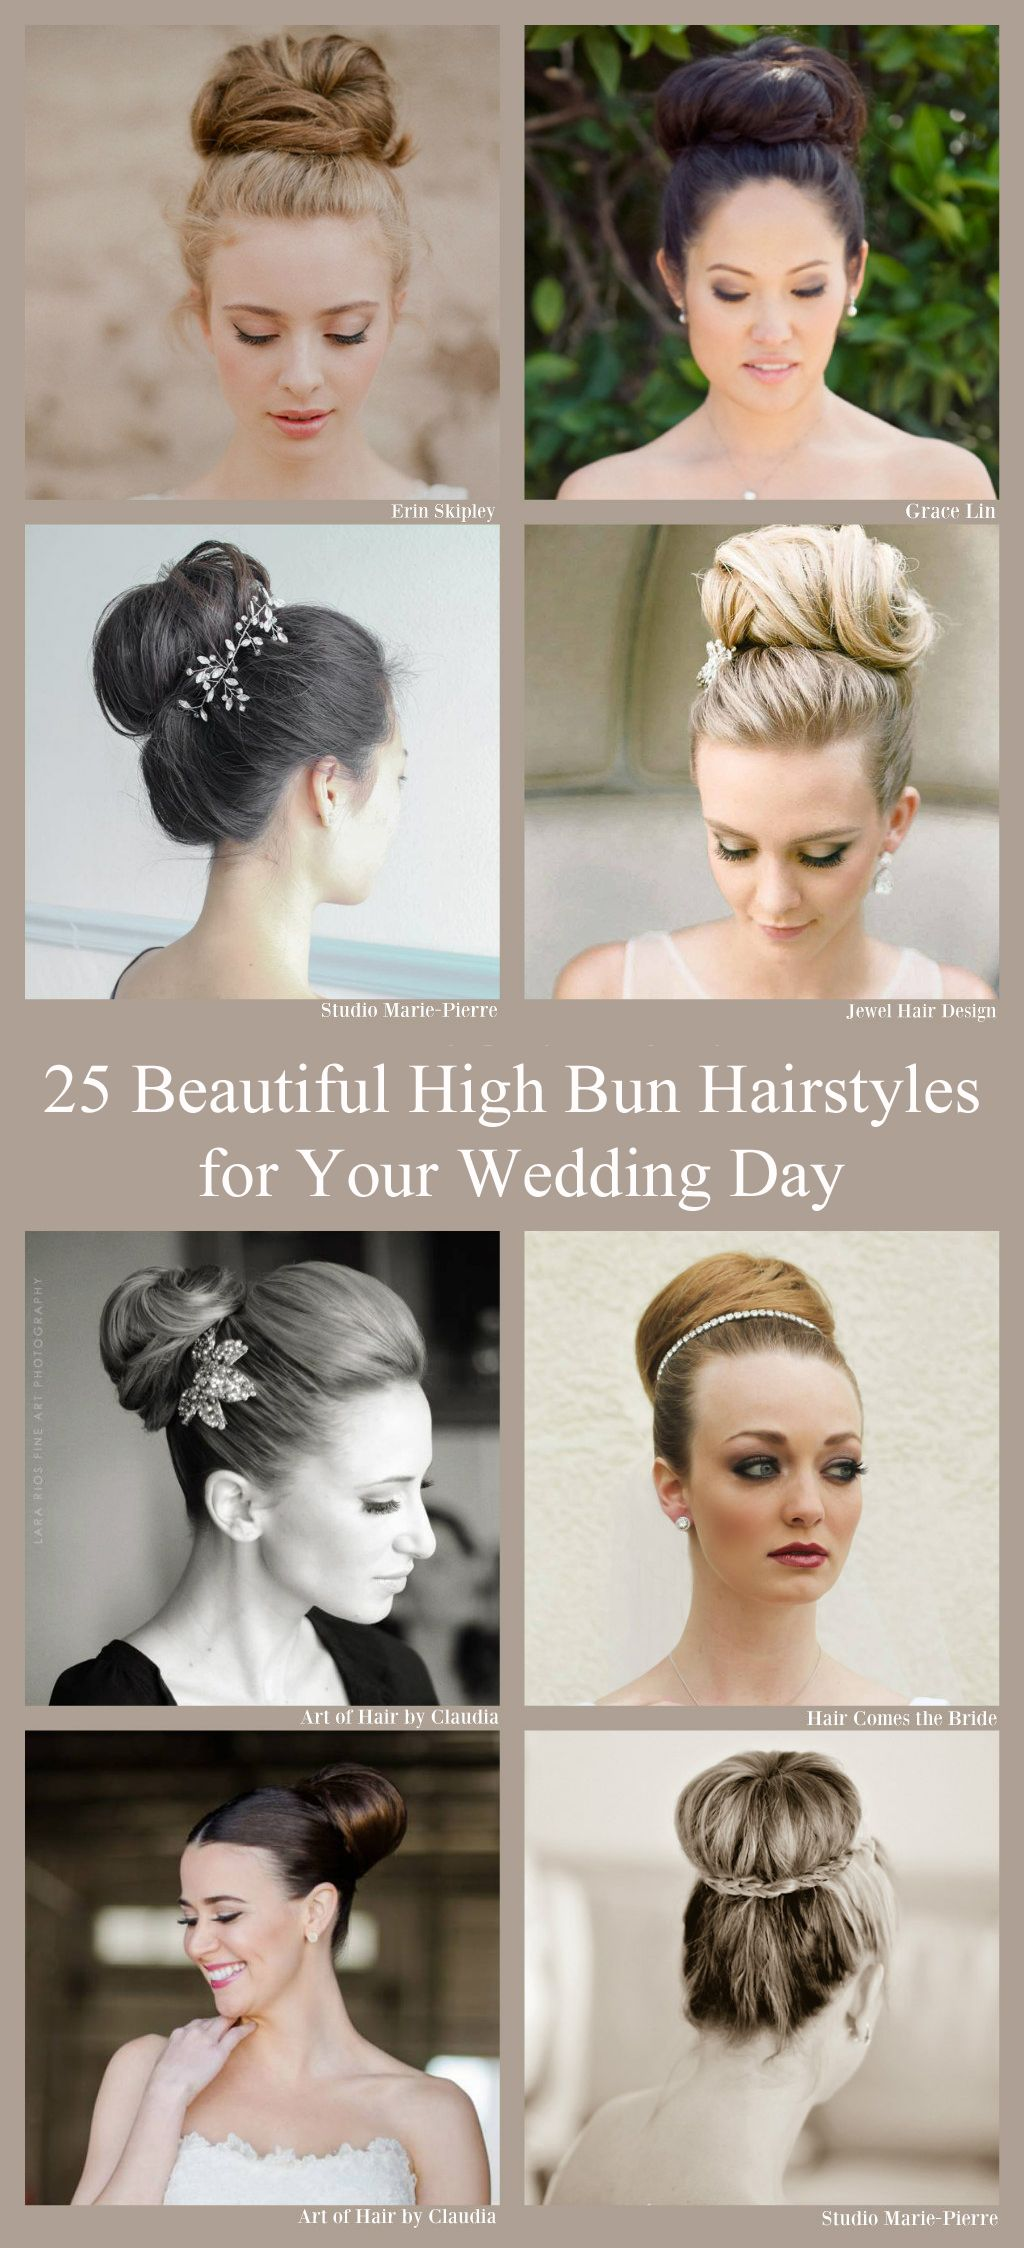 Different Bun Hairstyles 15 Pretty Chignon Bun Hairstyles To Try Buns High Bun